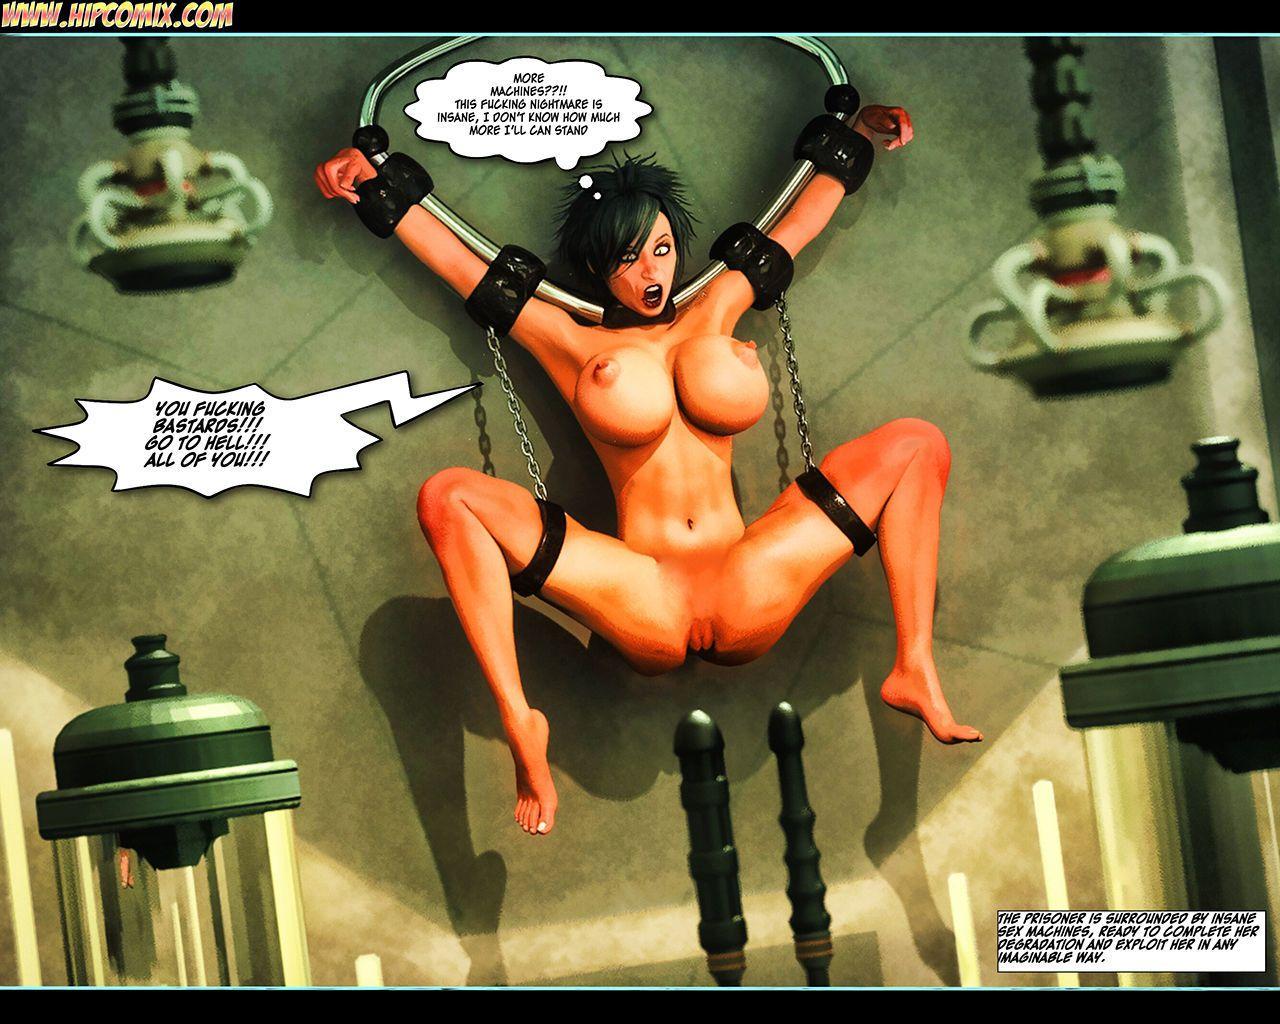 [Mitru] Hip Girl - Captive of Guul 1-8 - part 6